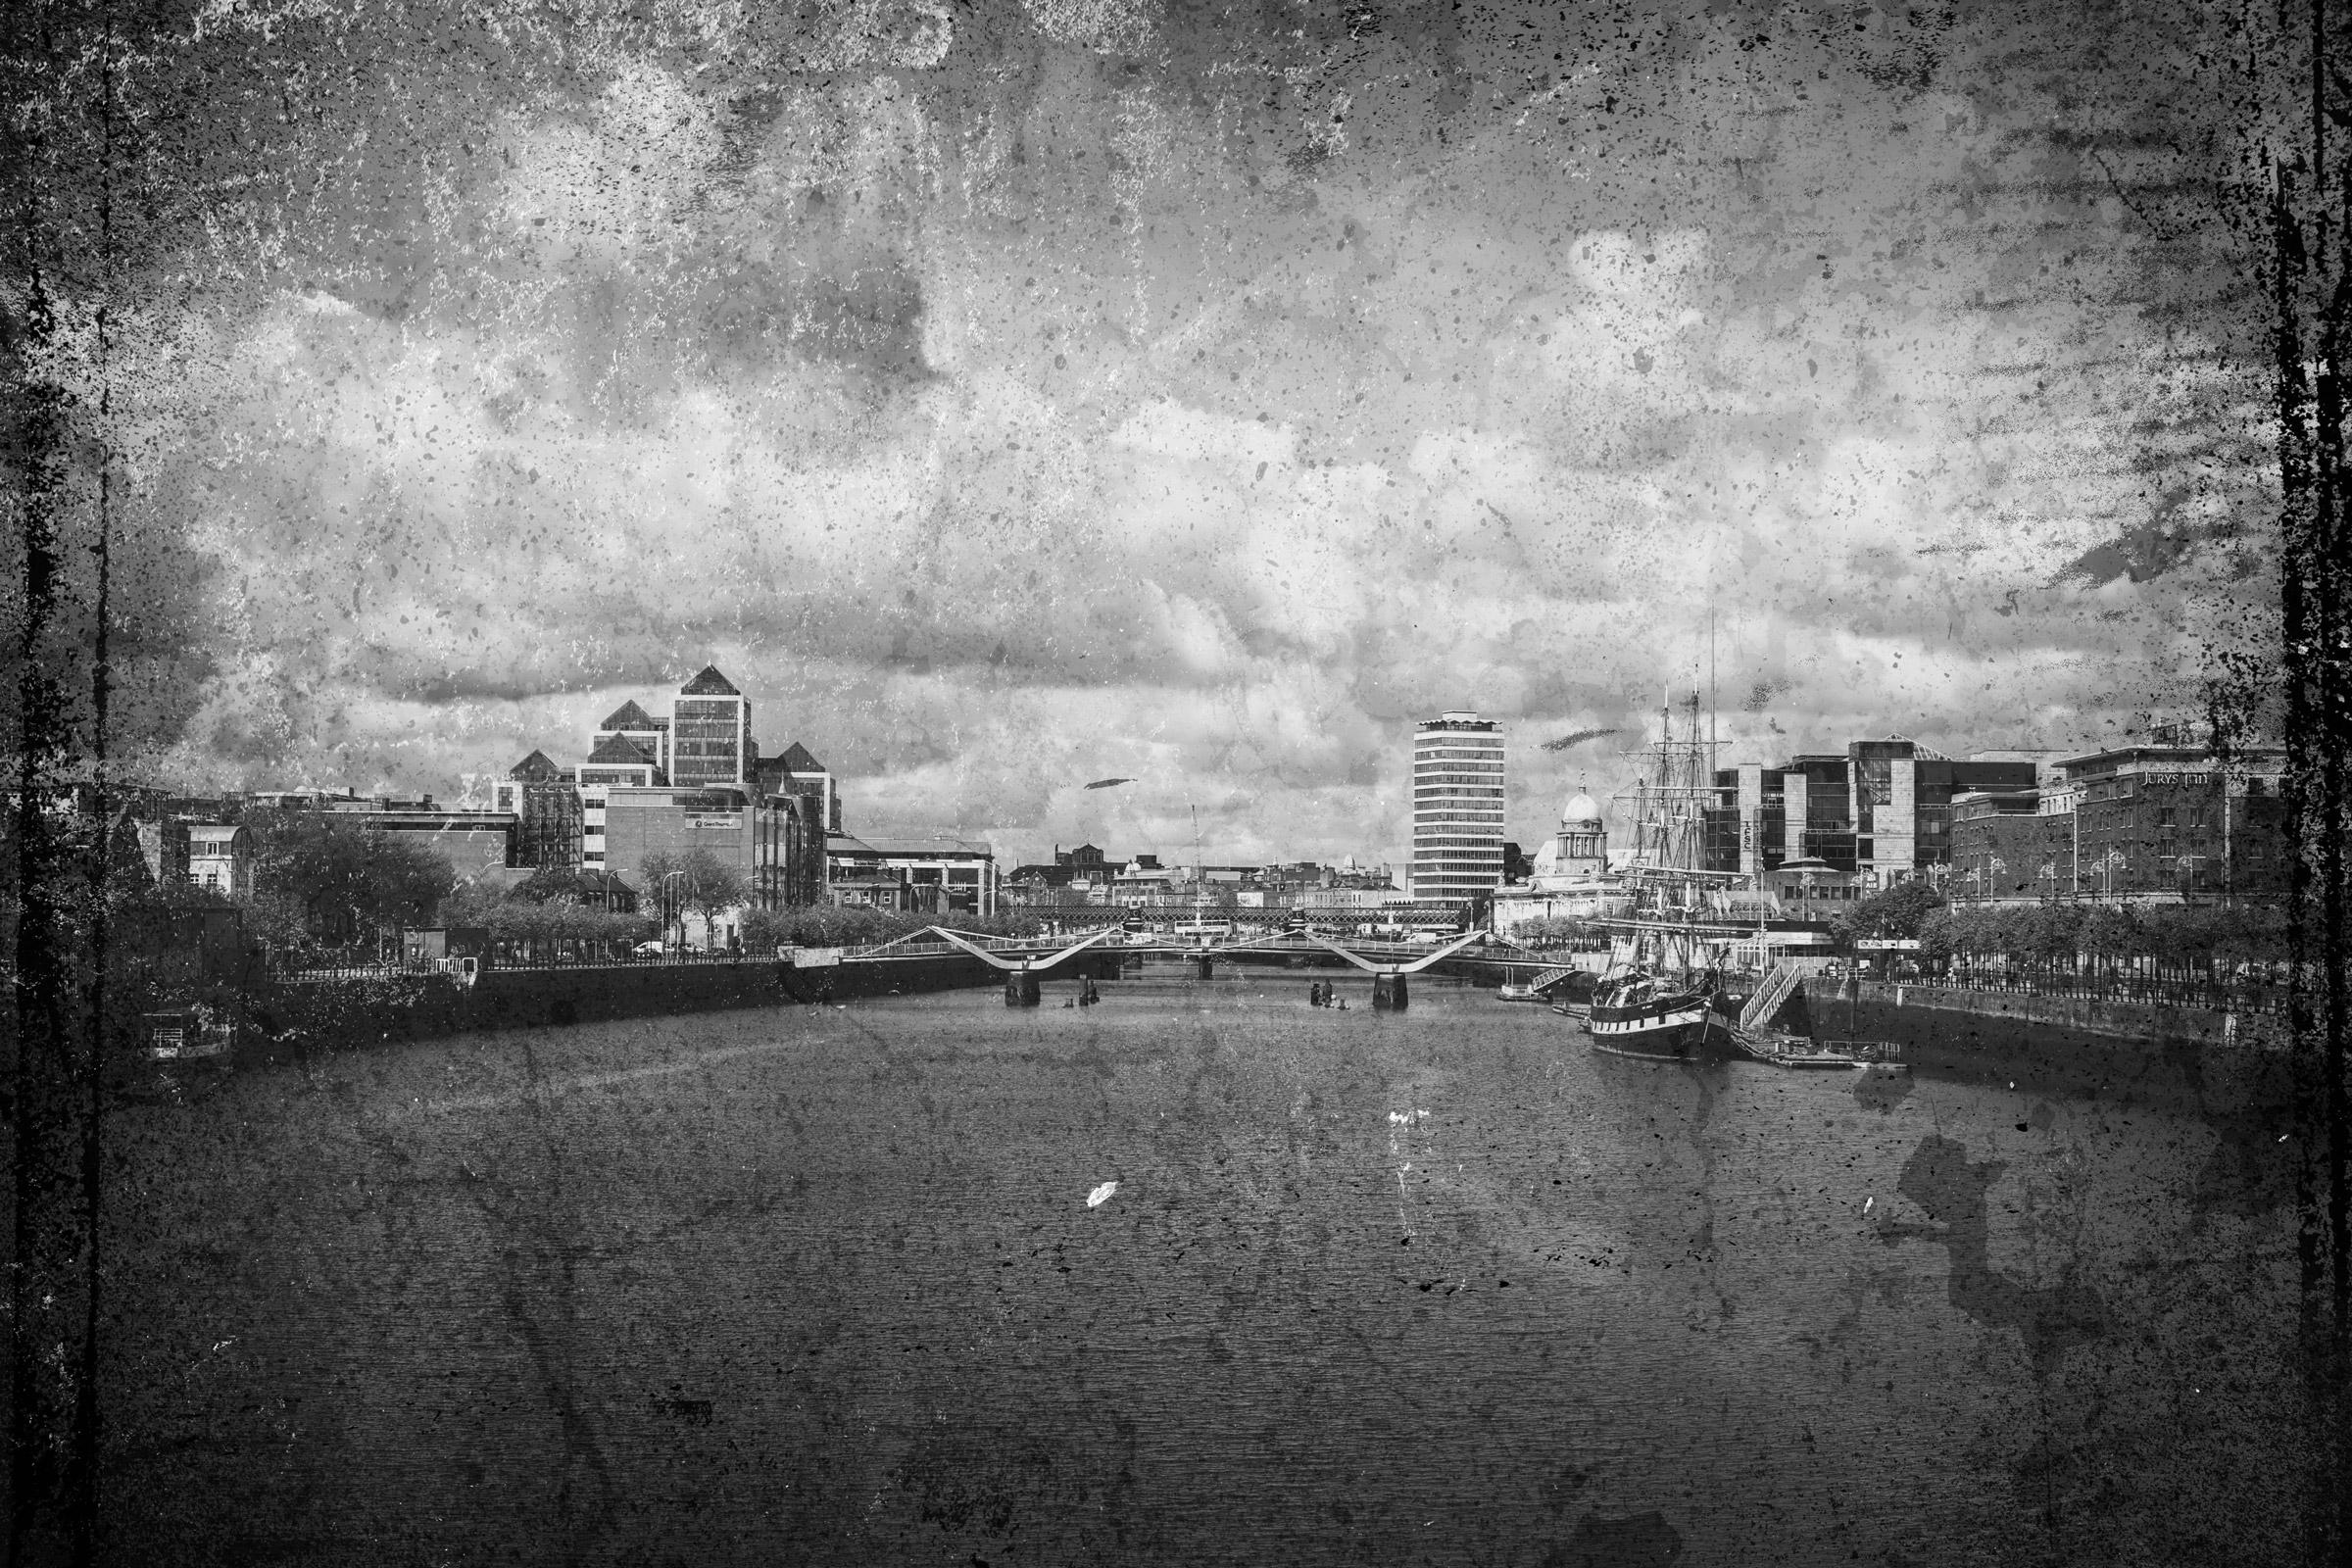 Boat-Edit.jpg